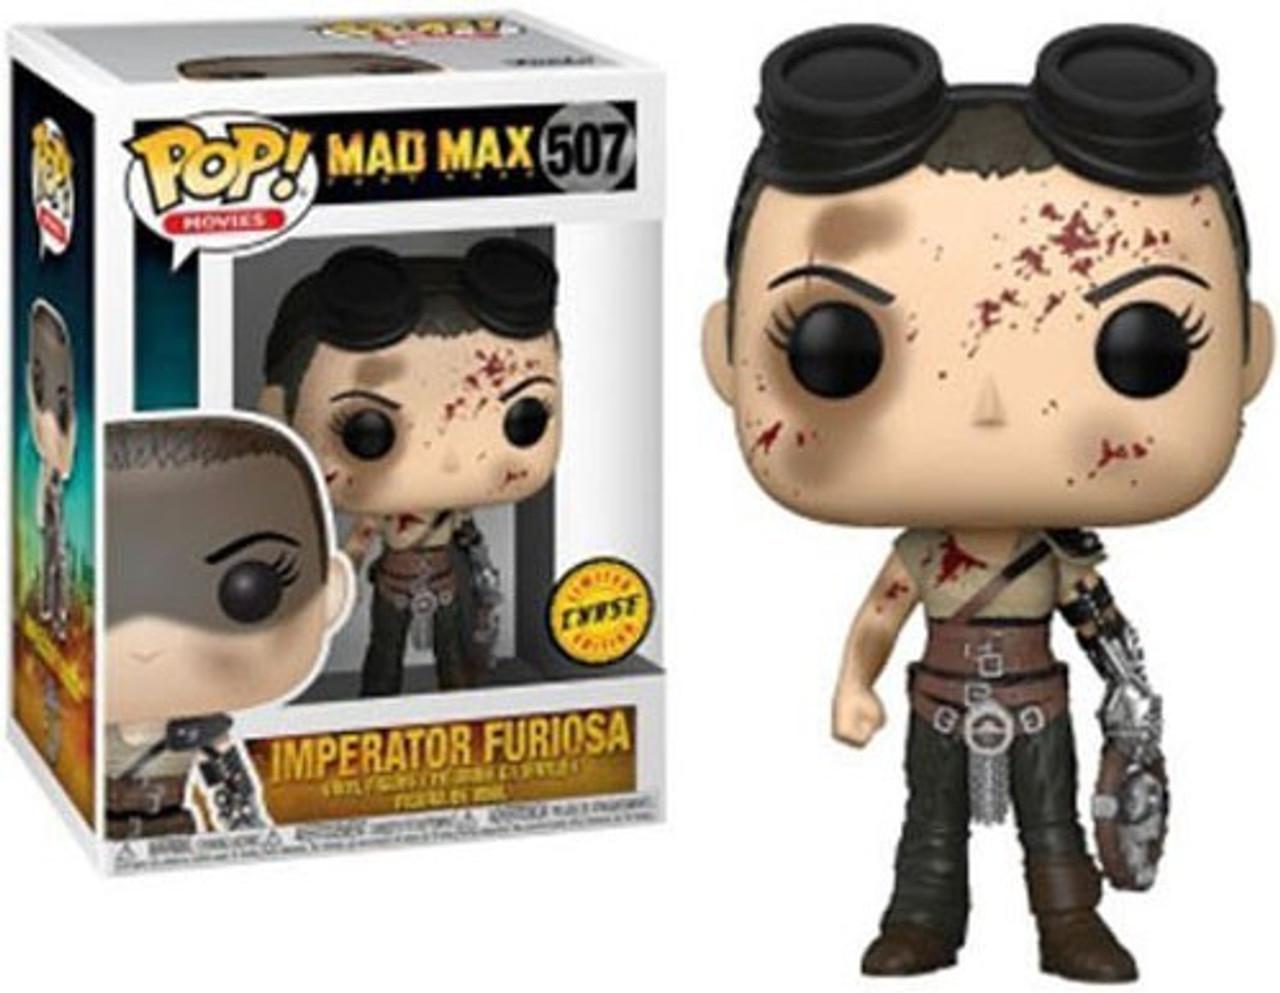 Movies-MAD MAX FURY ROAD-Imperator FURIOSA Funko Pop